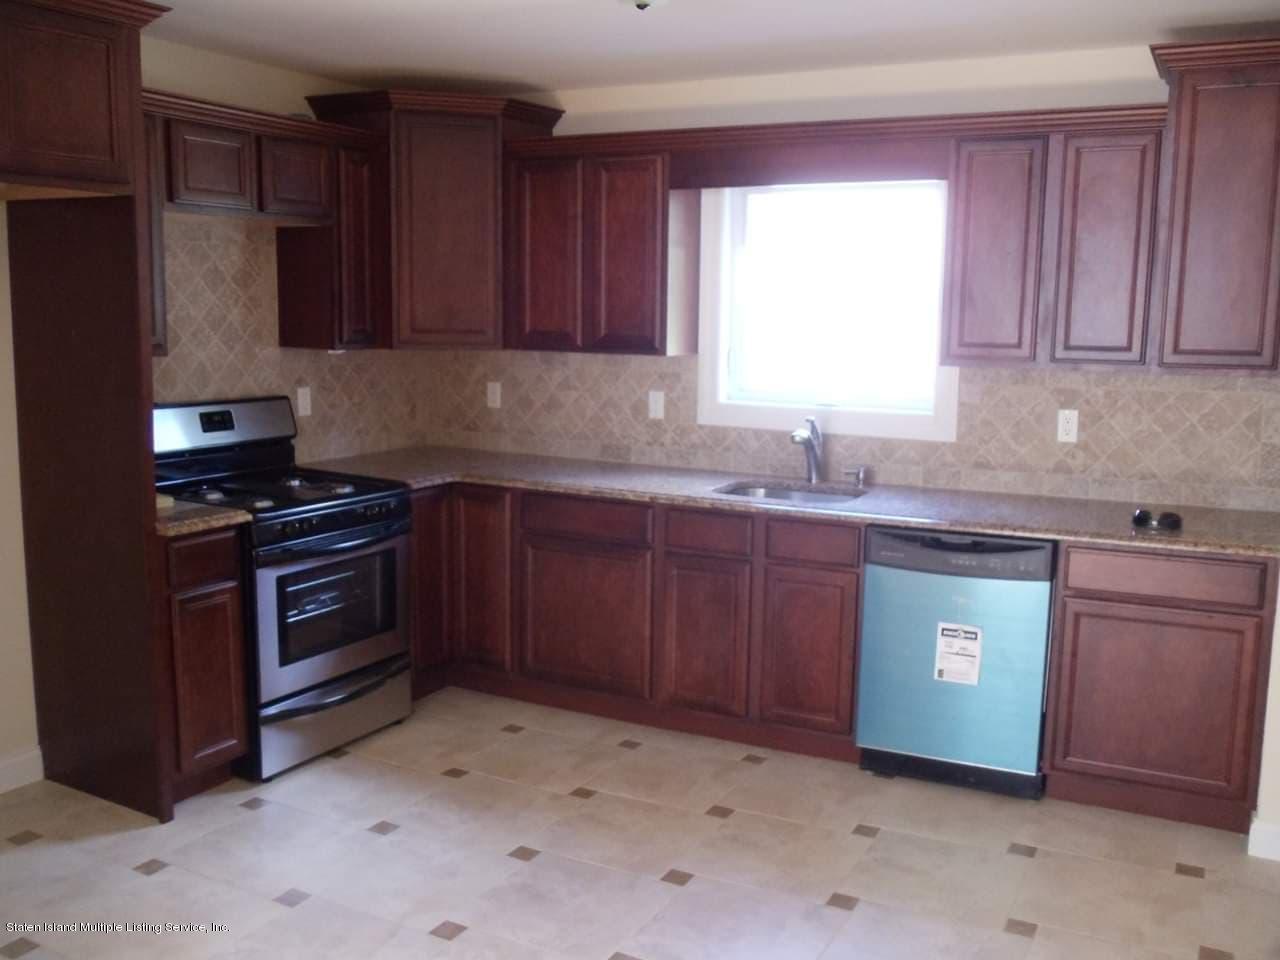 4151 Amboy Road,Staten Island,New York,10308,United States,3 Bedrooms Bedrooms,12 Rooms Rooms,2 BathroomsBathrooms,Res-Rental,Amboy,1129761